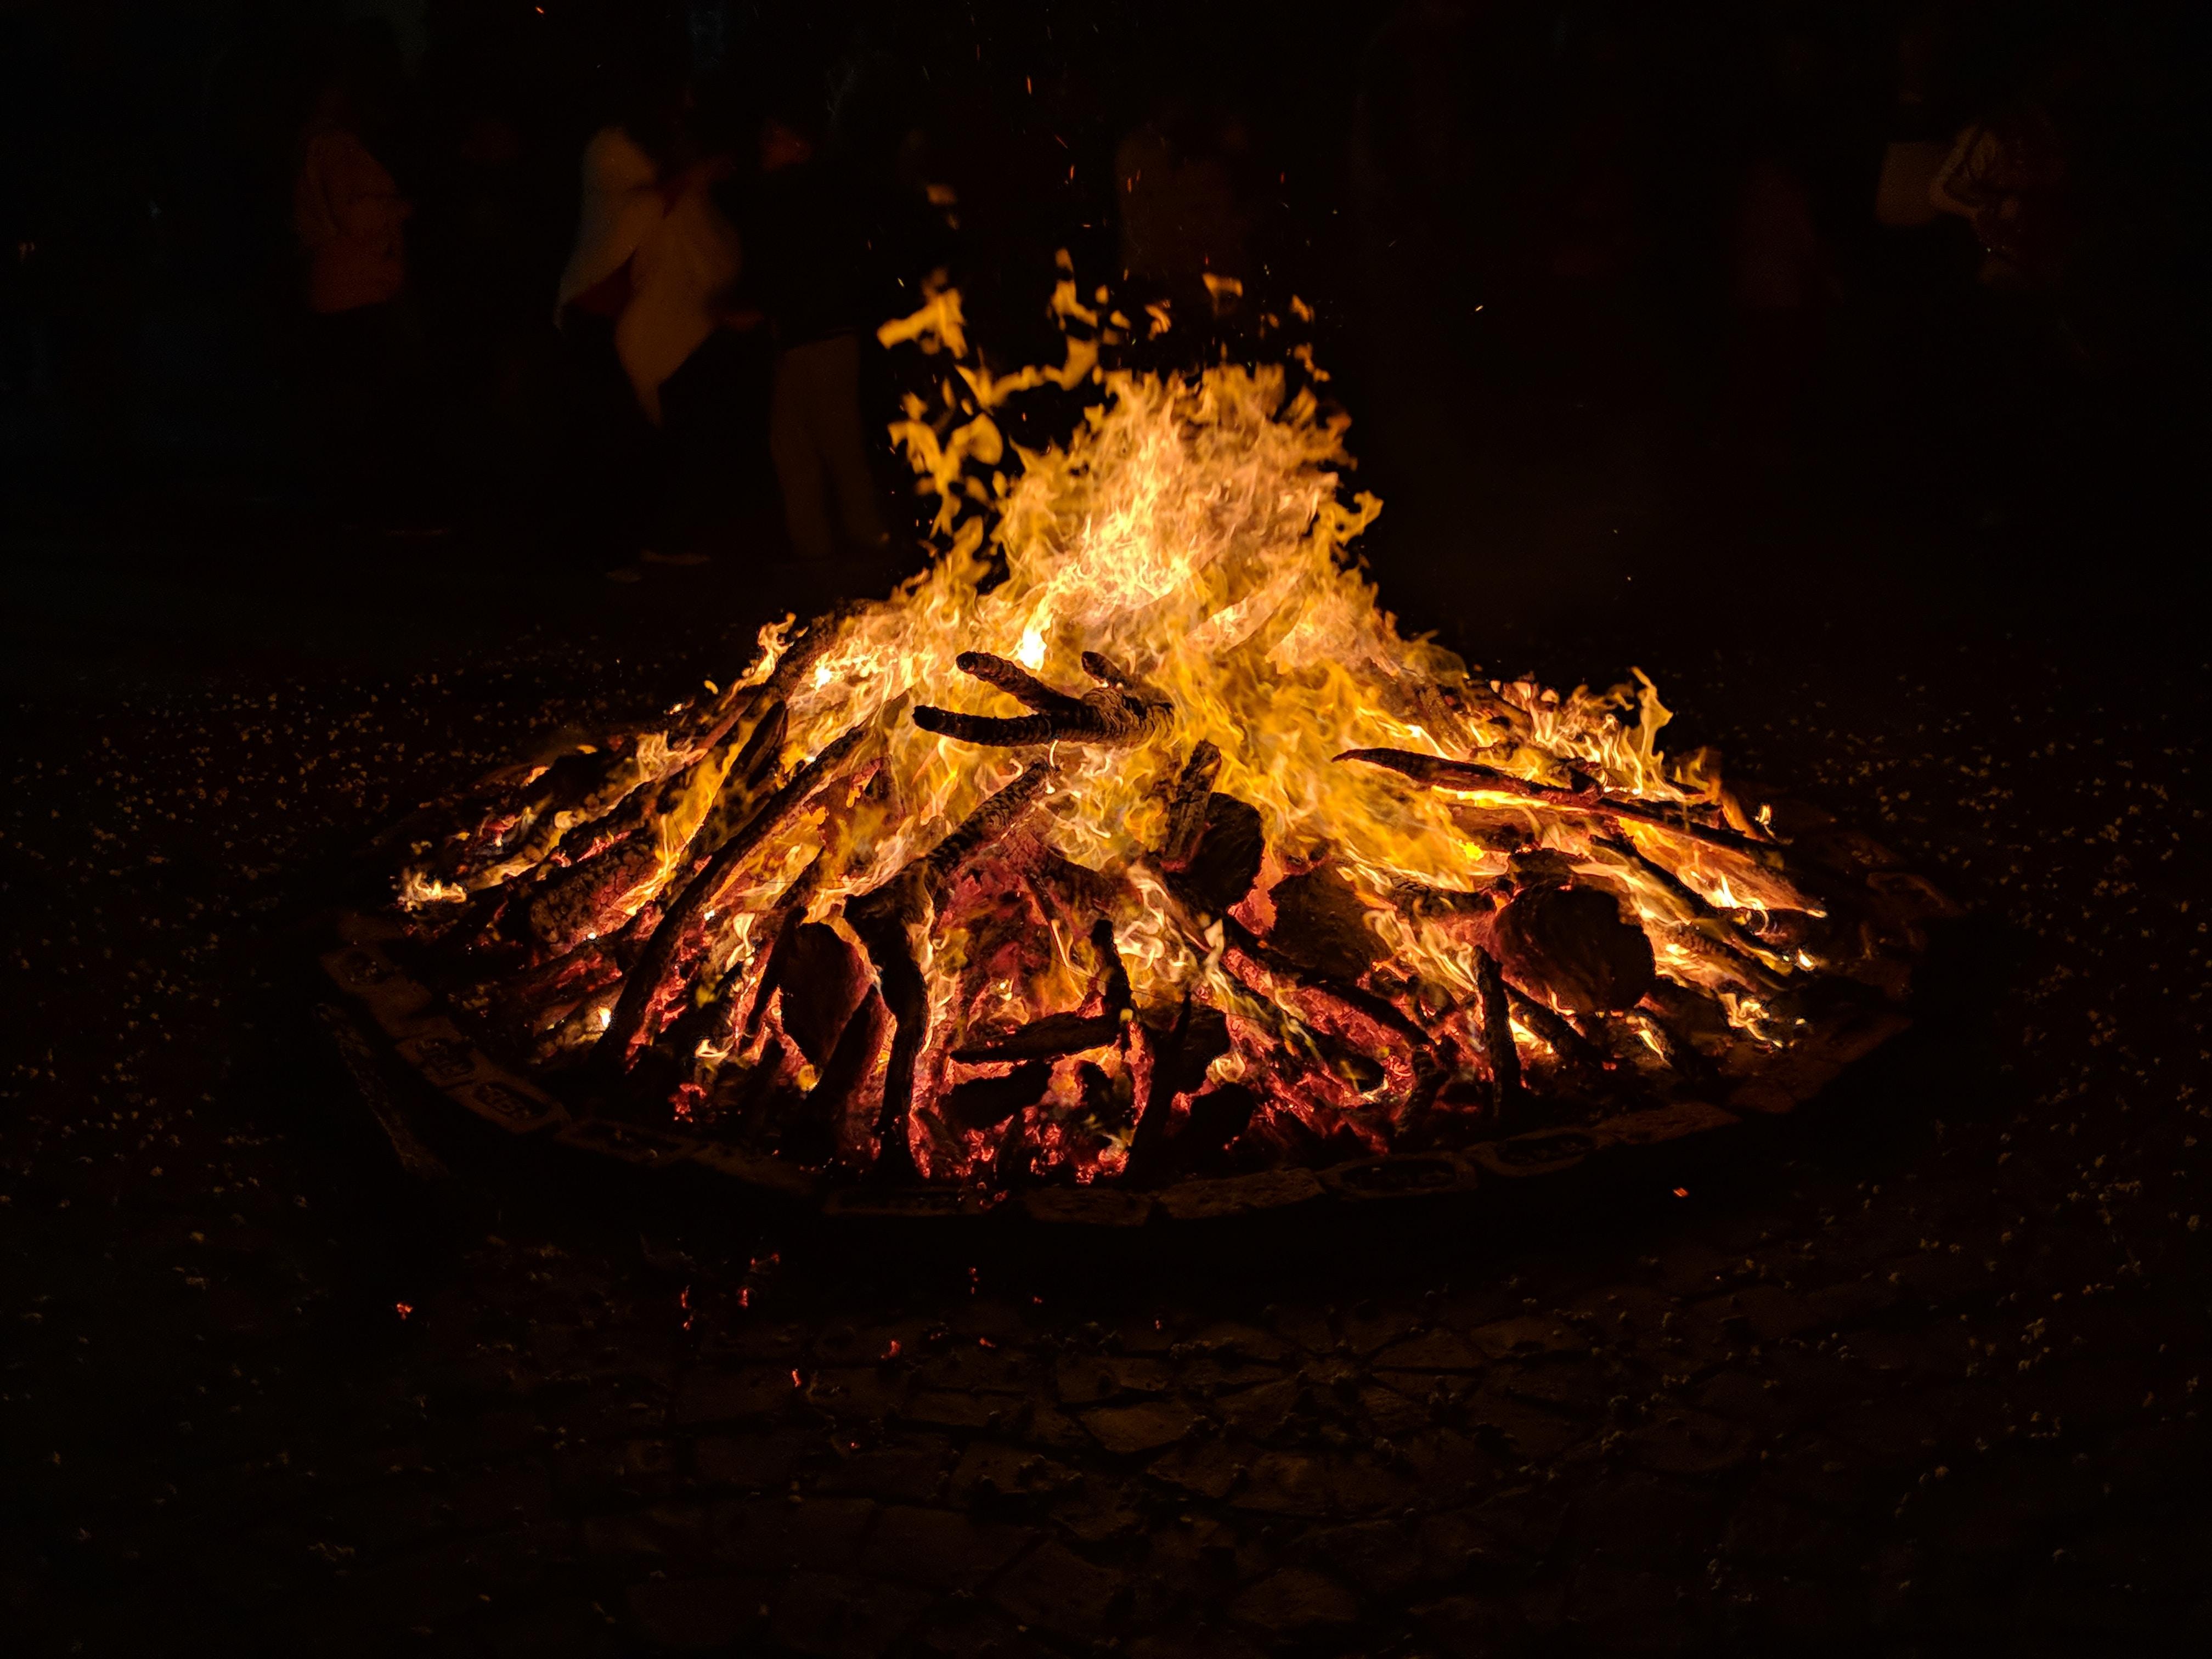 lit-up firewood